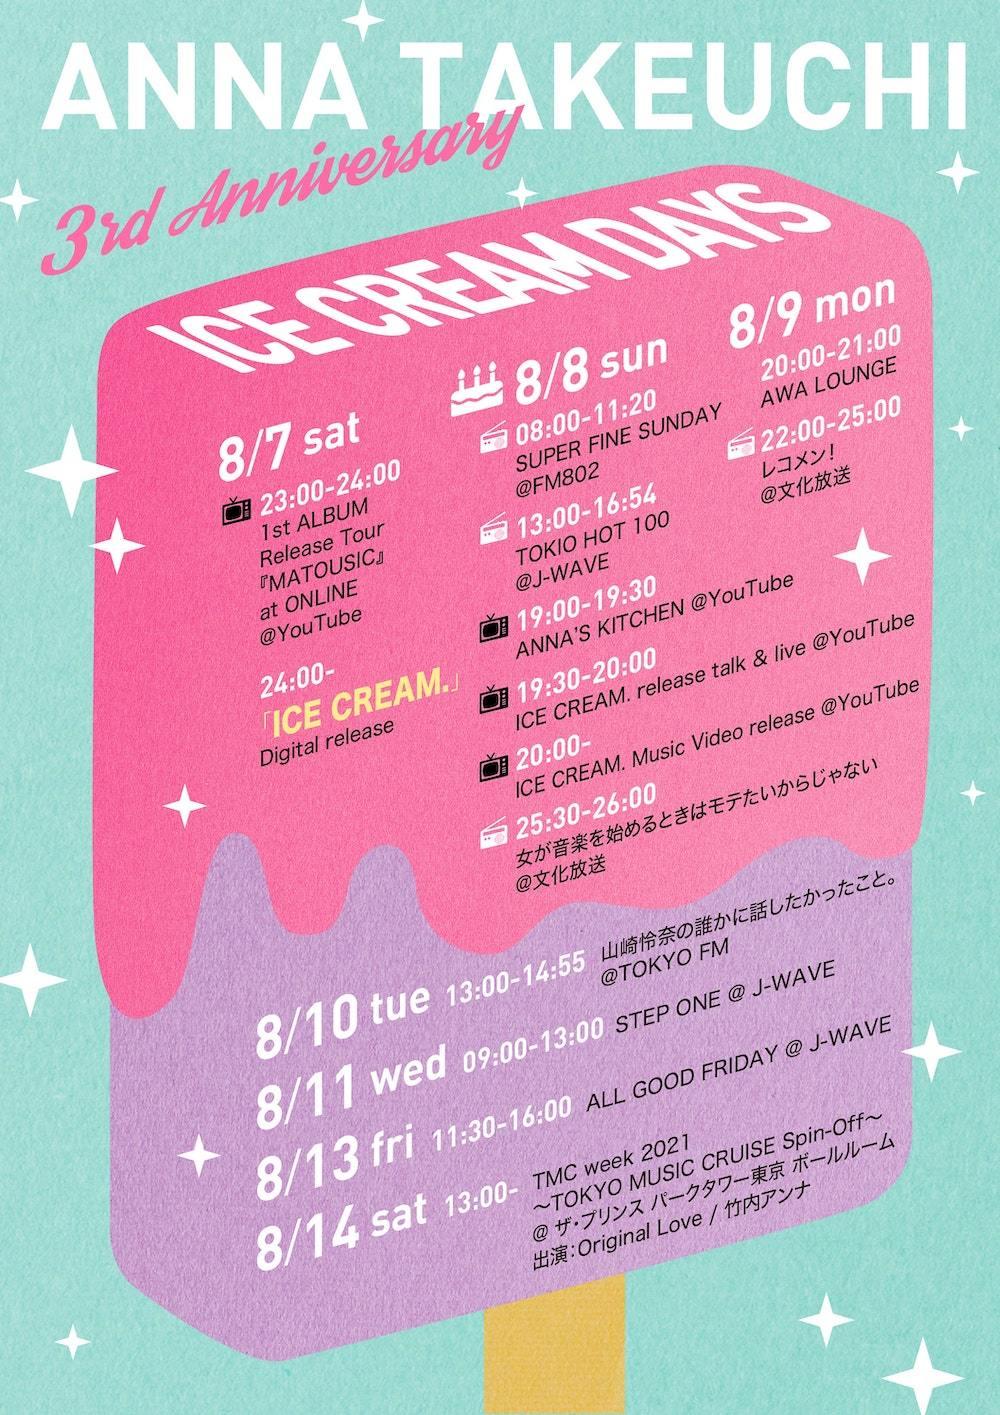 『ANNA TAKEUCHI 3rd Anniversary -ICE CREAM DAYS-』